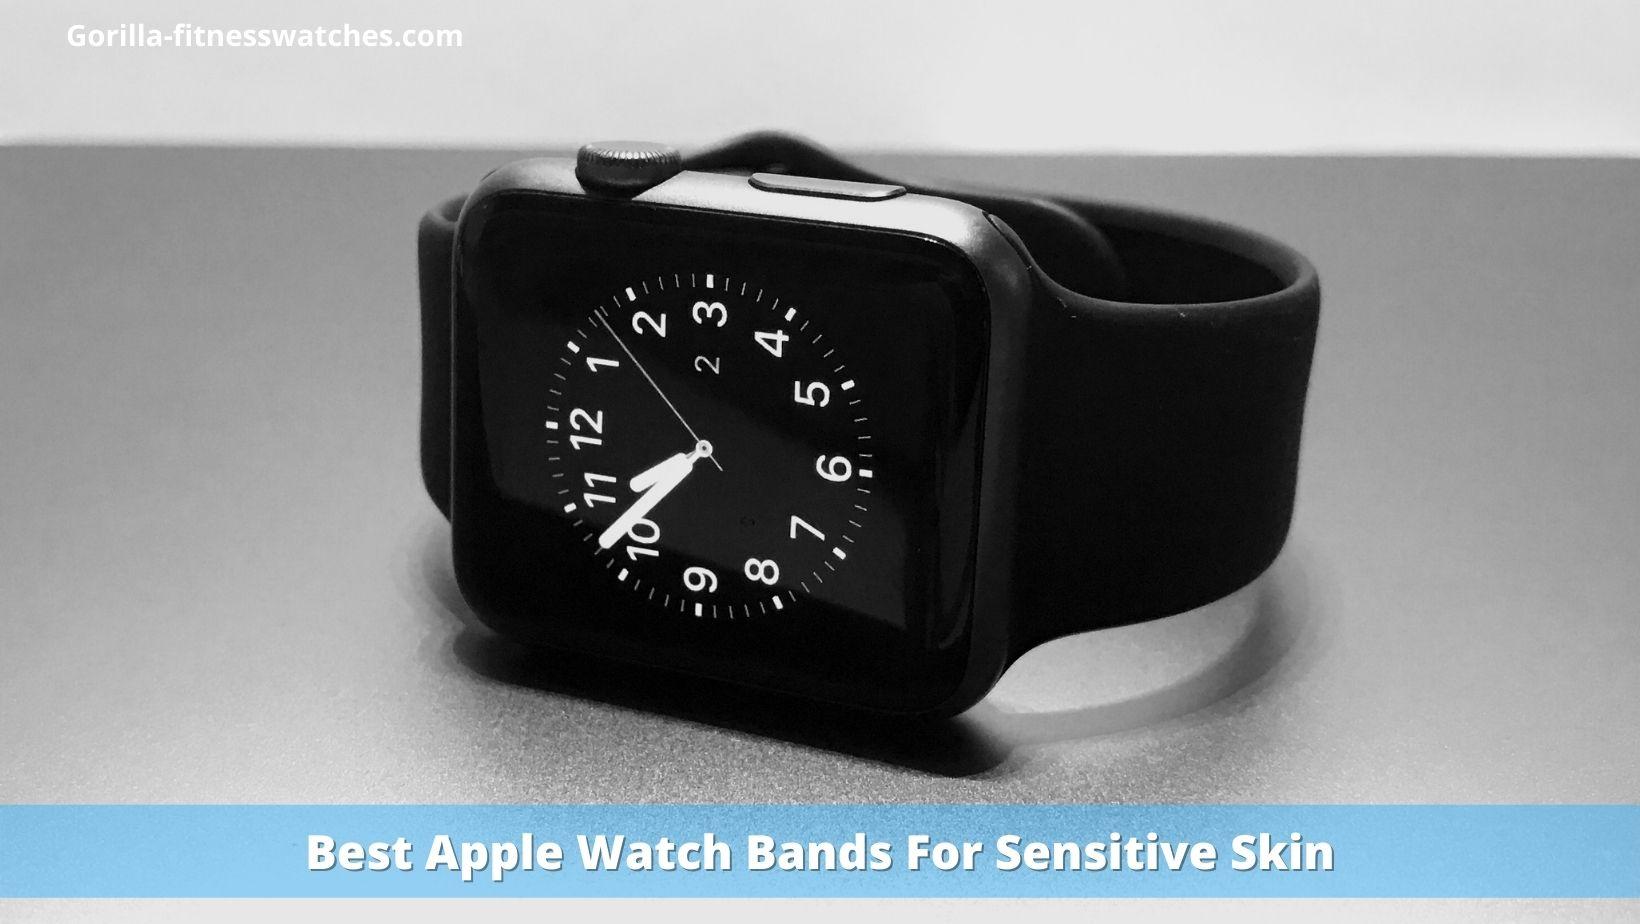 Best Apple Watch Bands For Sensitive Skin